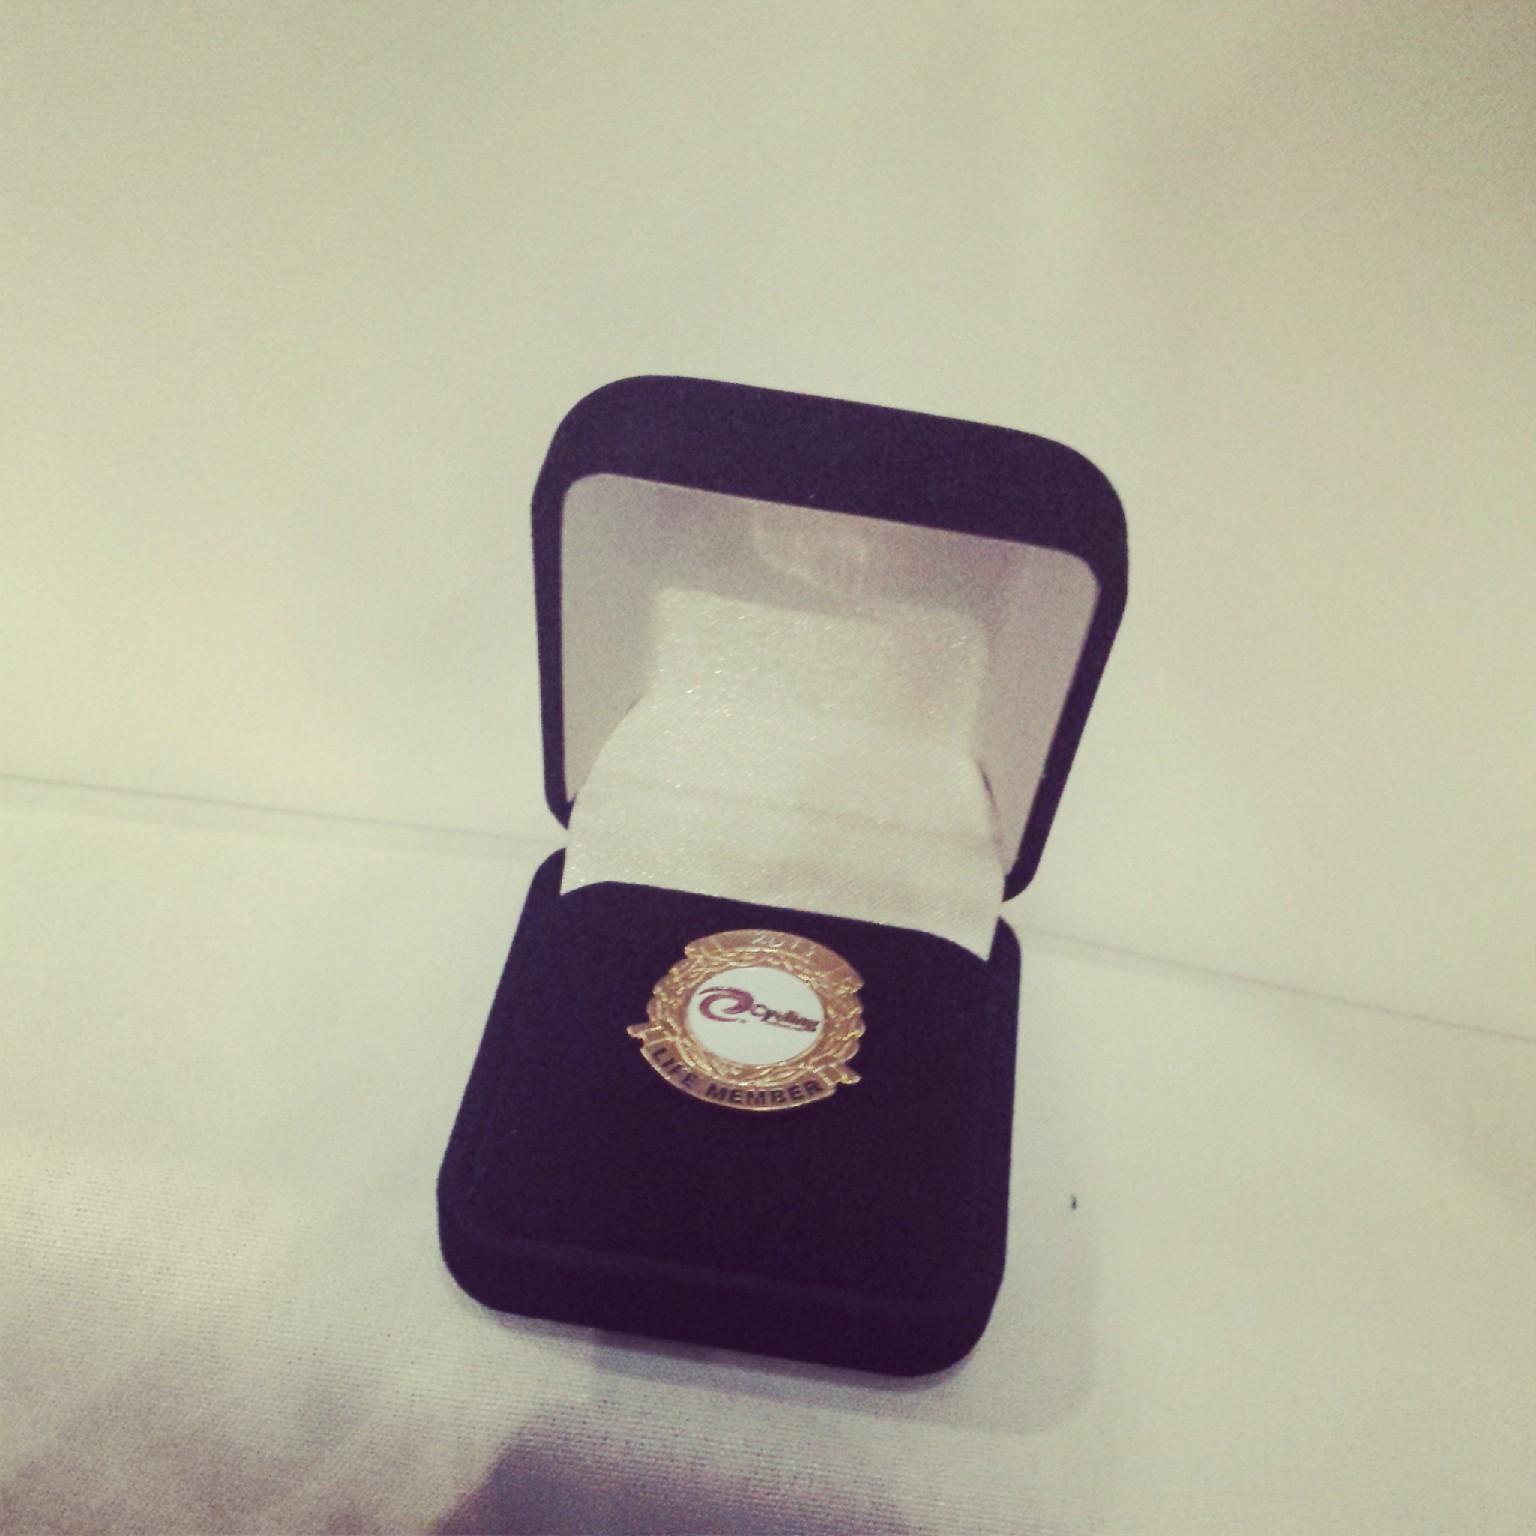 Mr Peter Rasell's Life Membership pin.